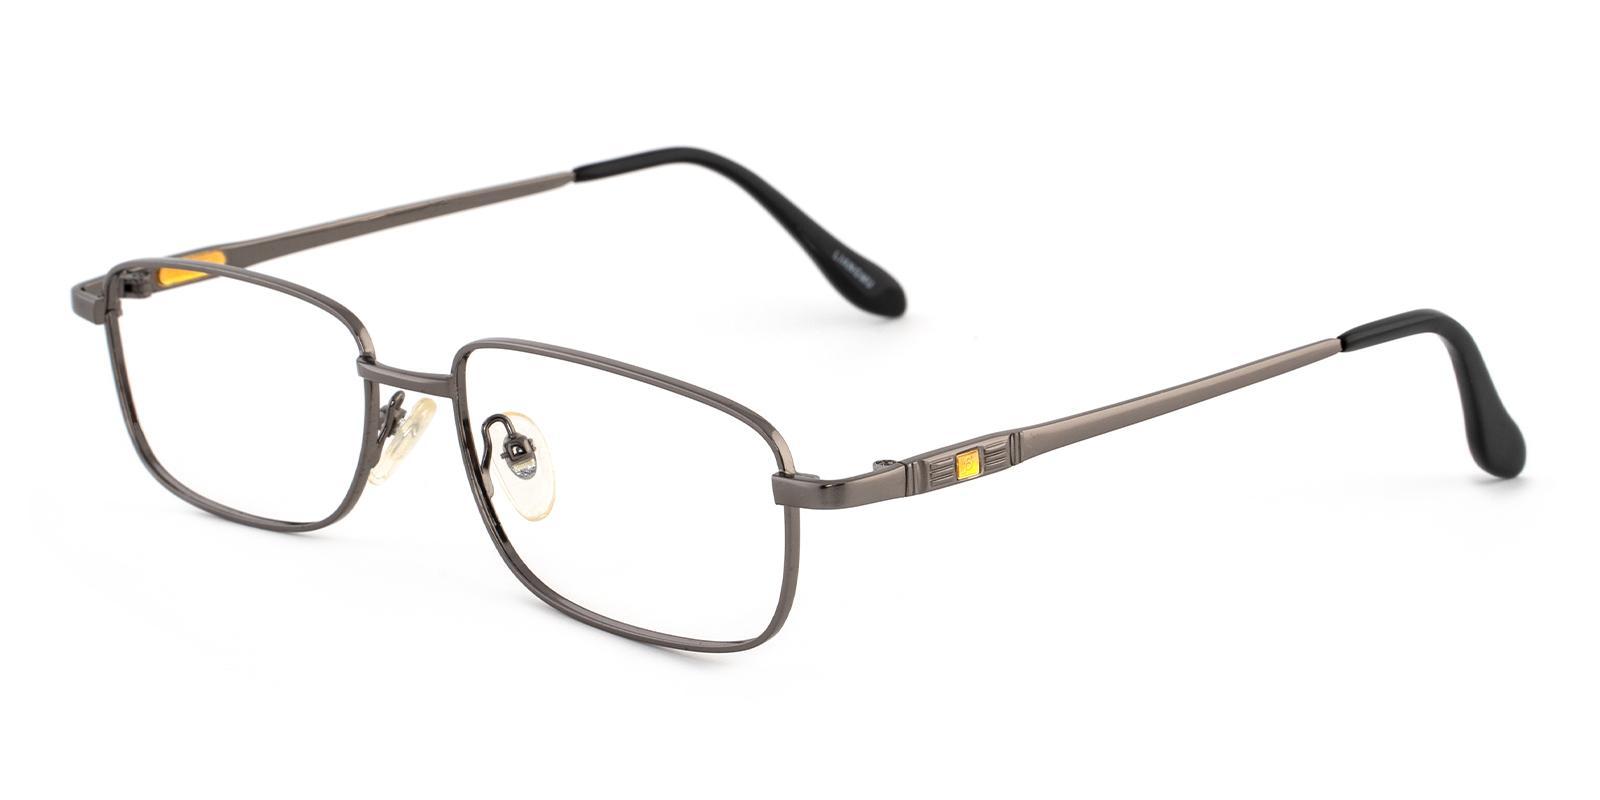 Aureate Gun Metal Eyeglasses , NosePads Frames from ABBE Glasses